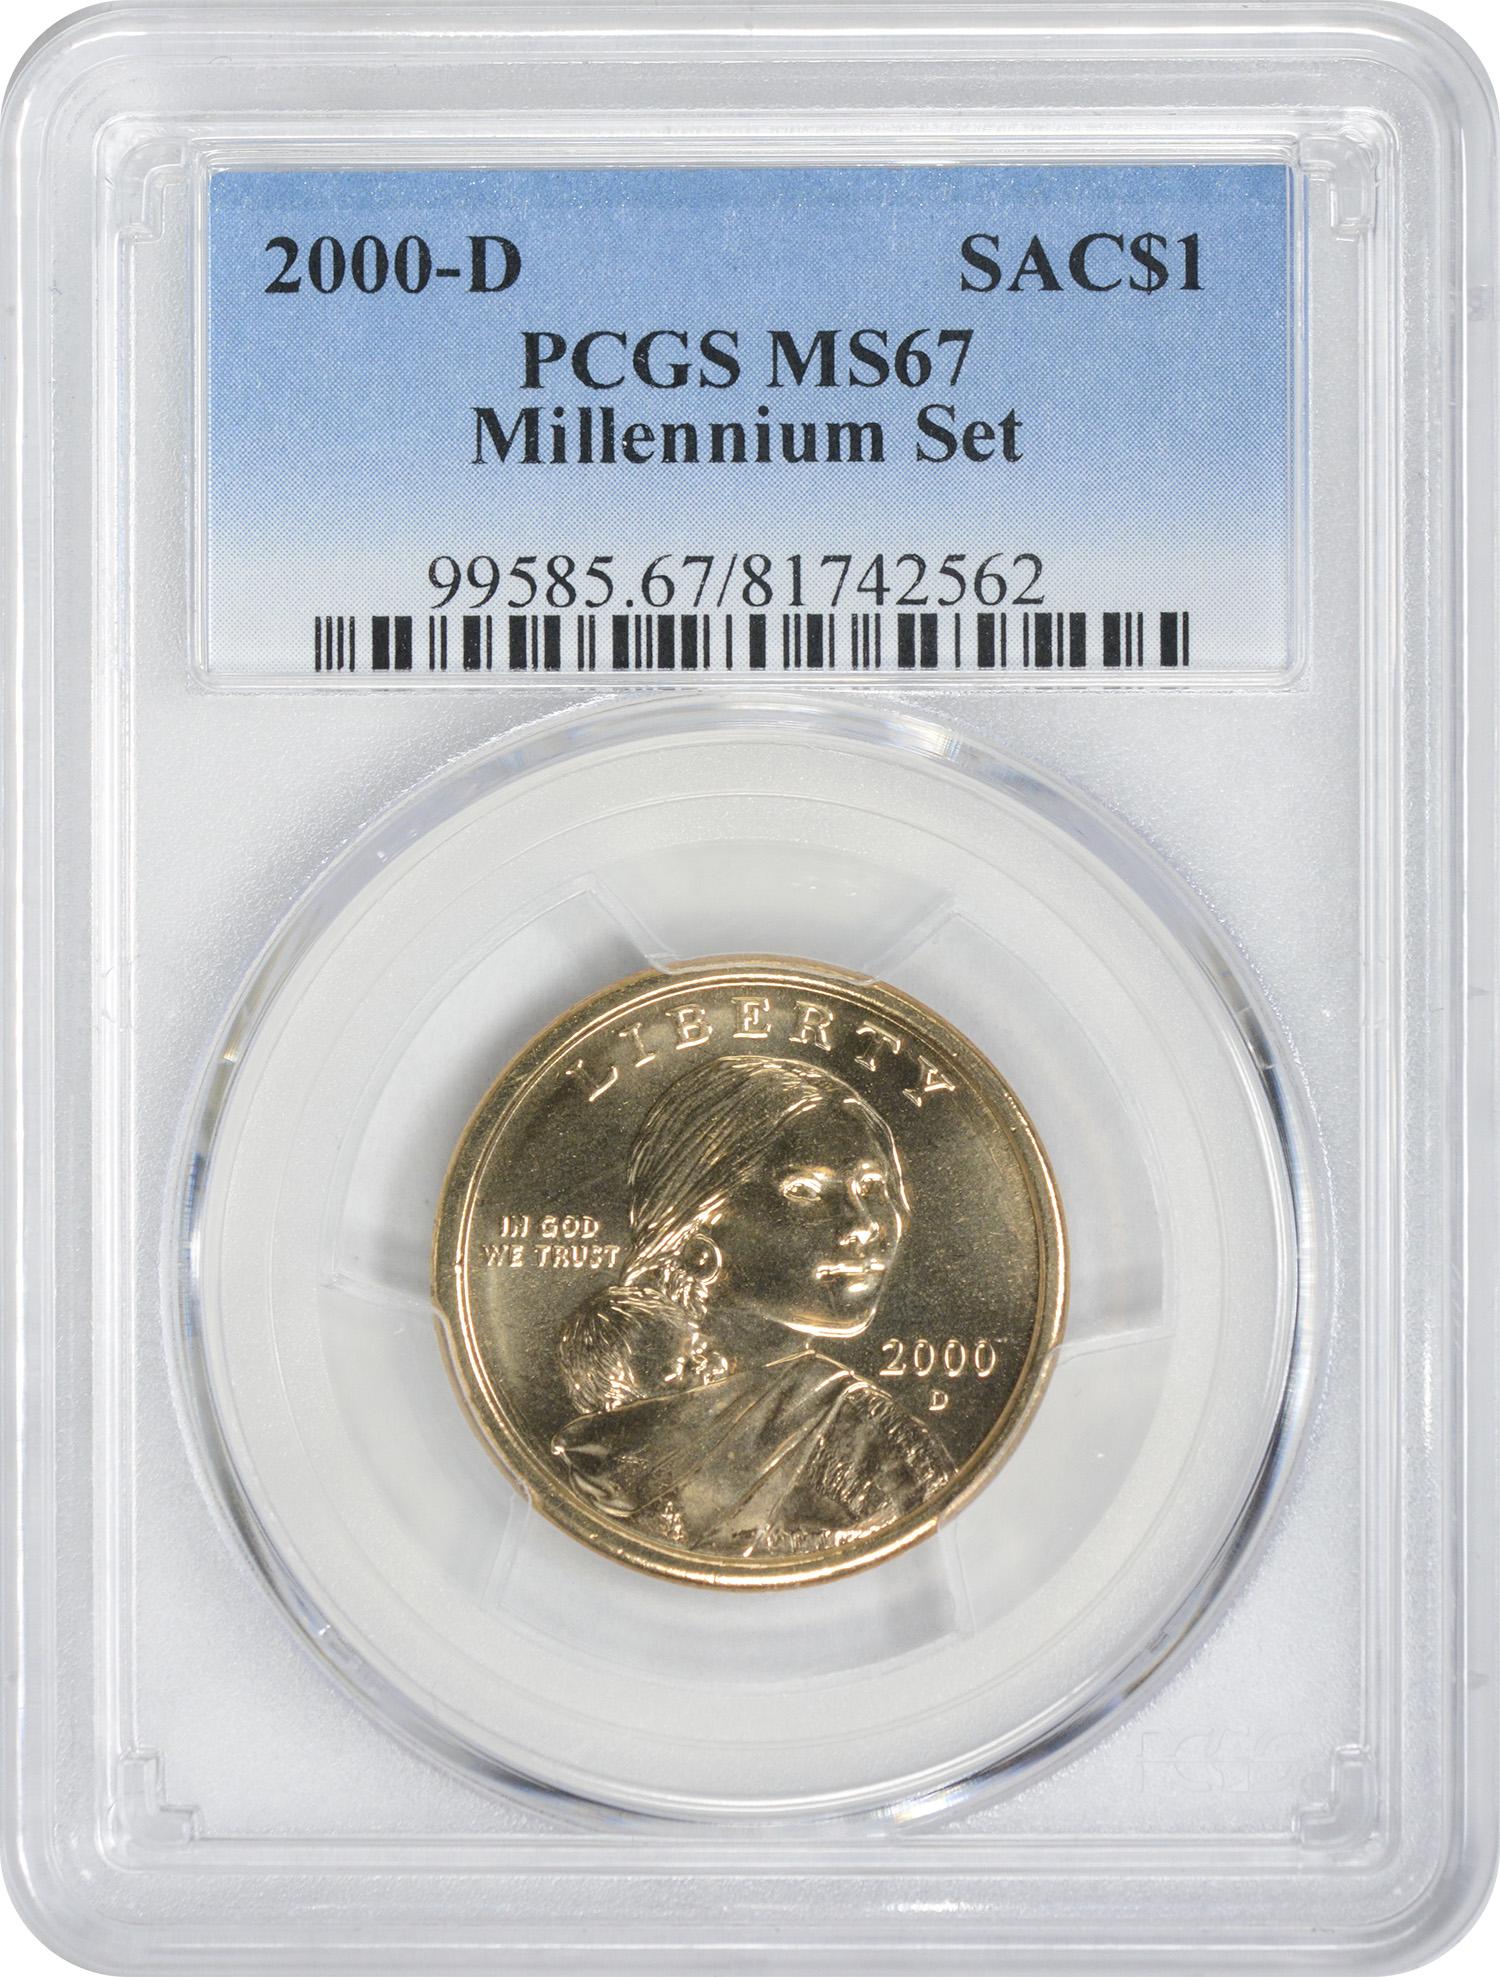 2000-D Sacagawea Dollar, Millennium Set, MS67, PCGS